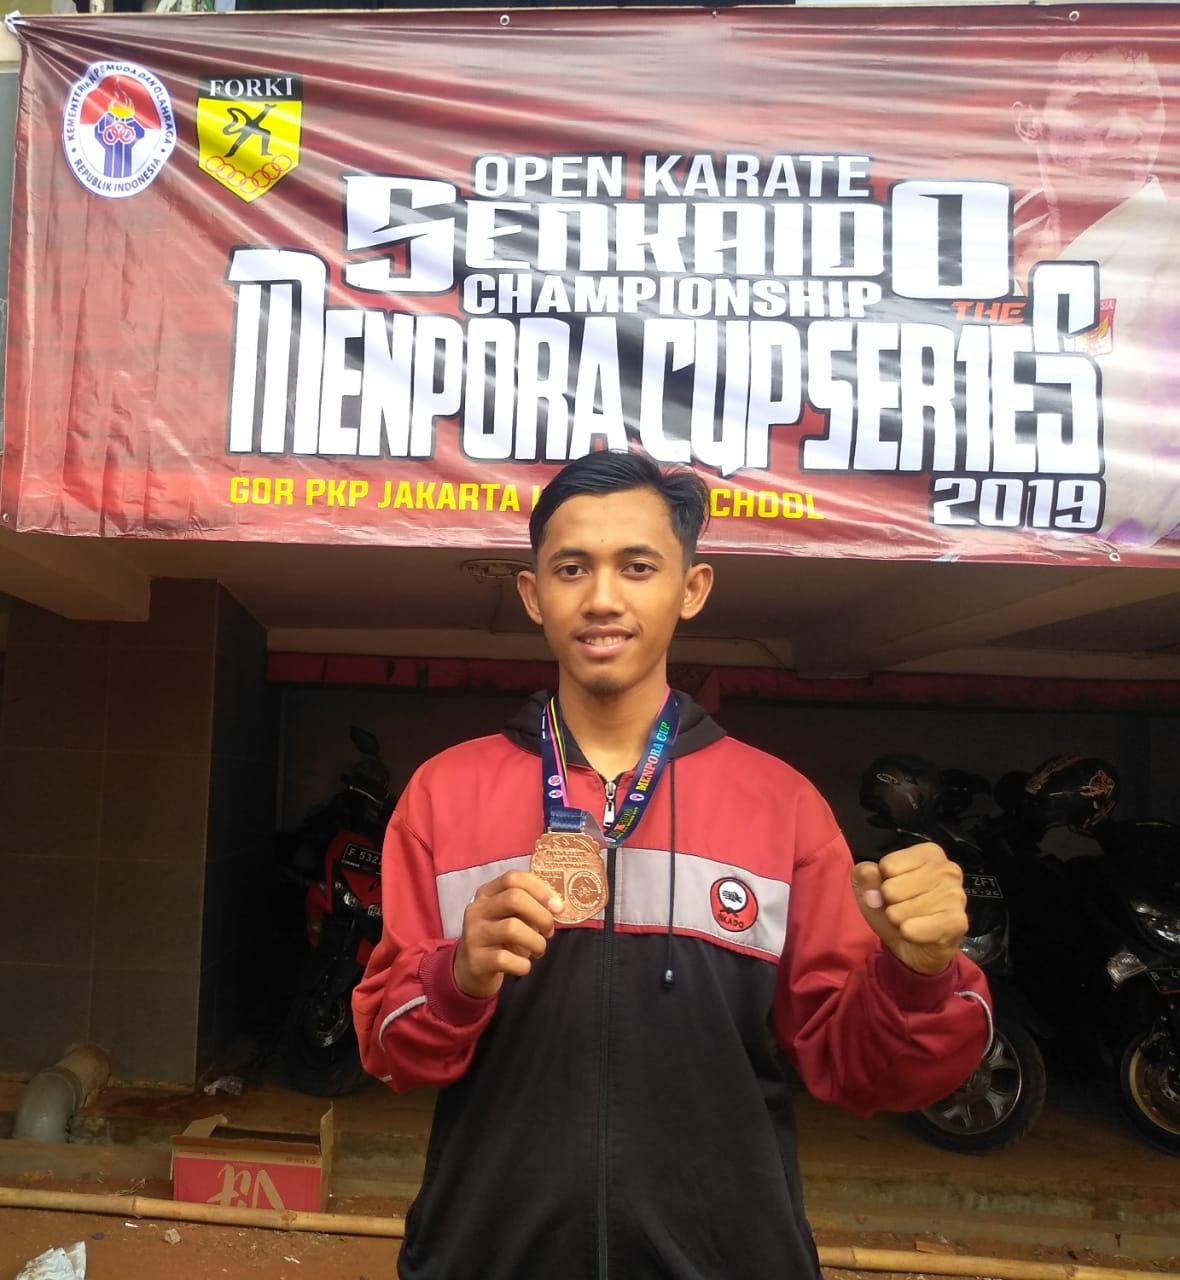 Mahasiswa IIB Darmajaya Juara III Open Karate Senkaido Championships Menpora Cup Series 2019